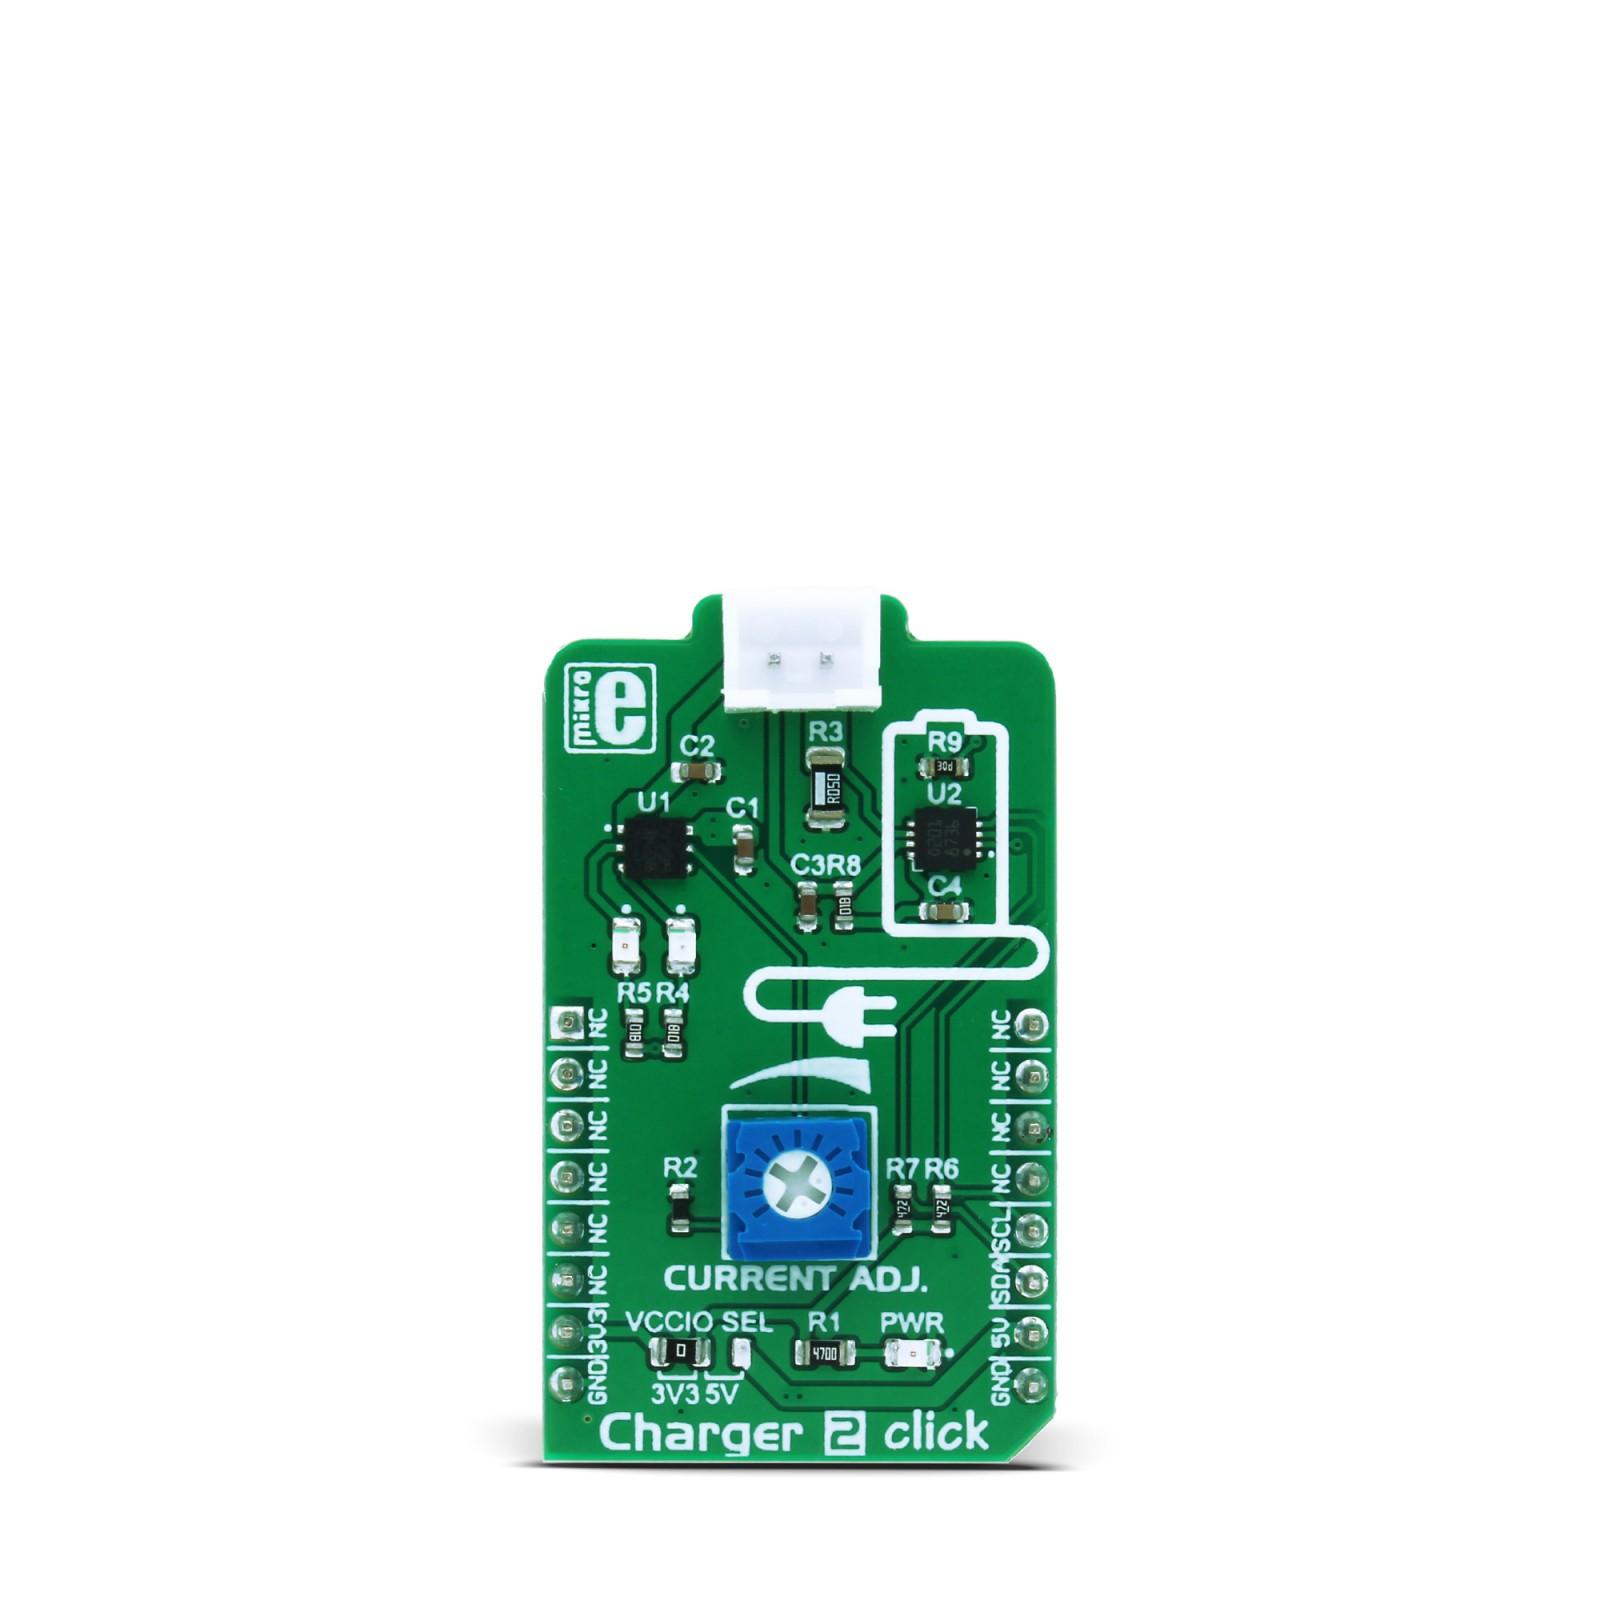 Charger 2 click | MikroElektronika